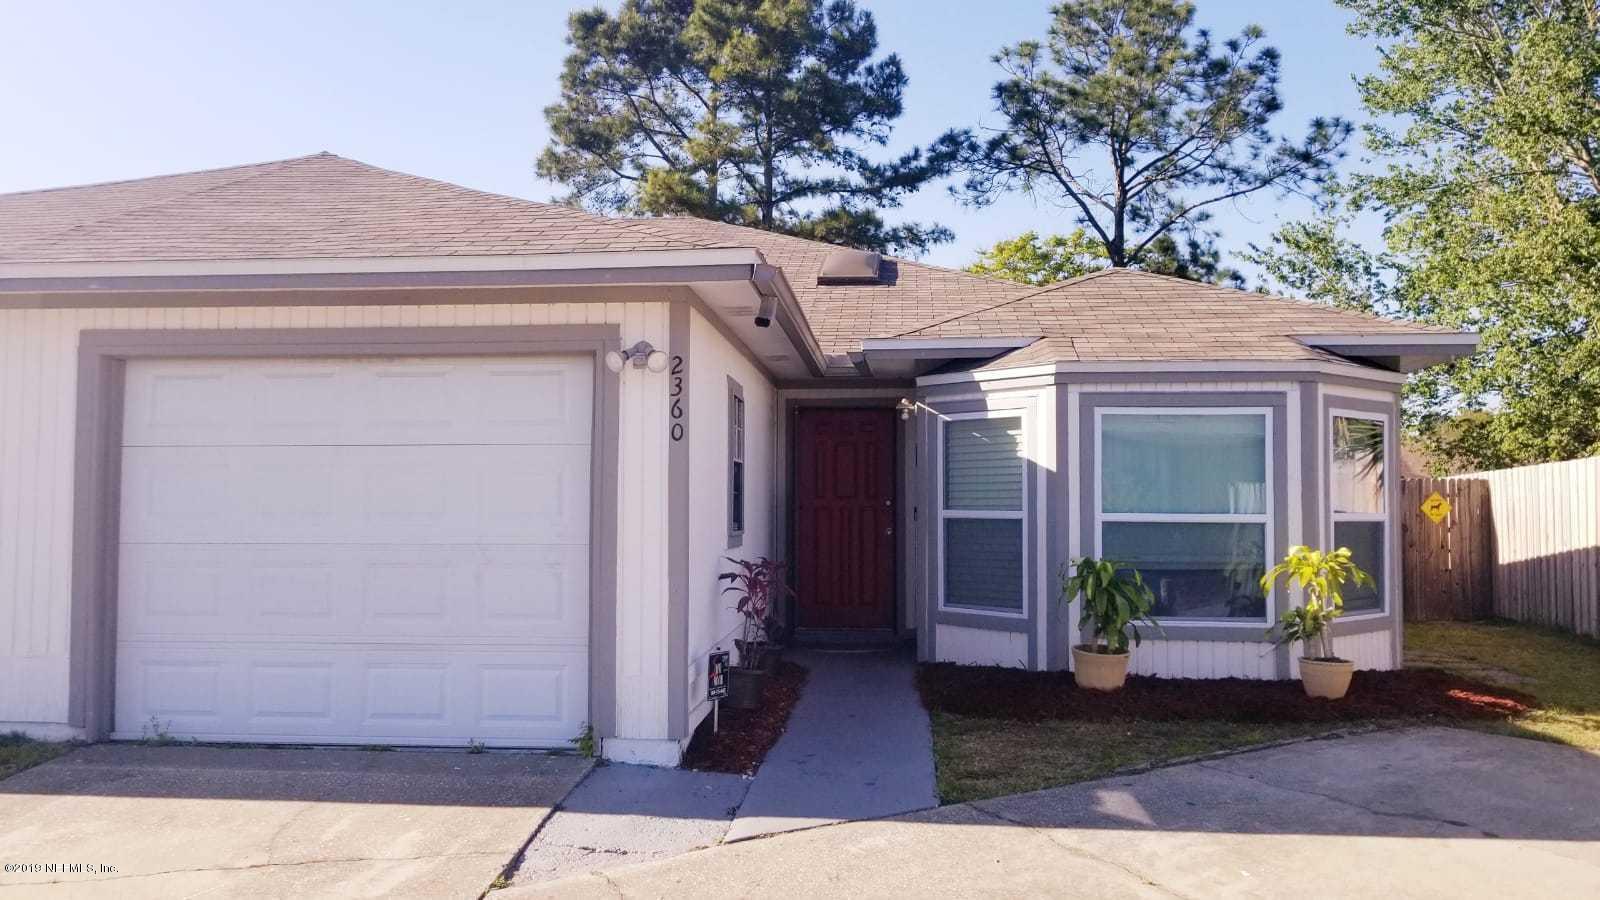 Photo of 2360 BITTERNUT, JACKSONVILLE, FL 32246